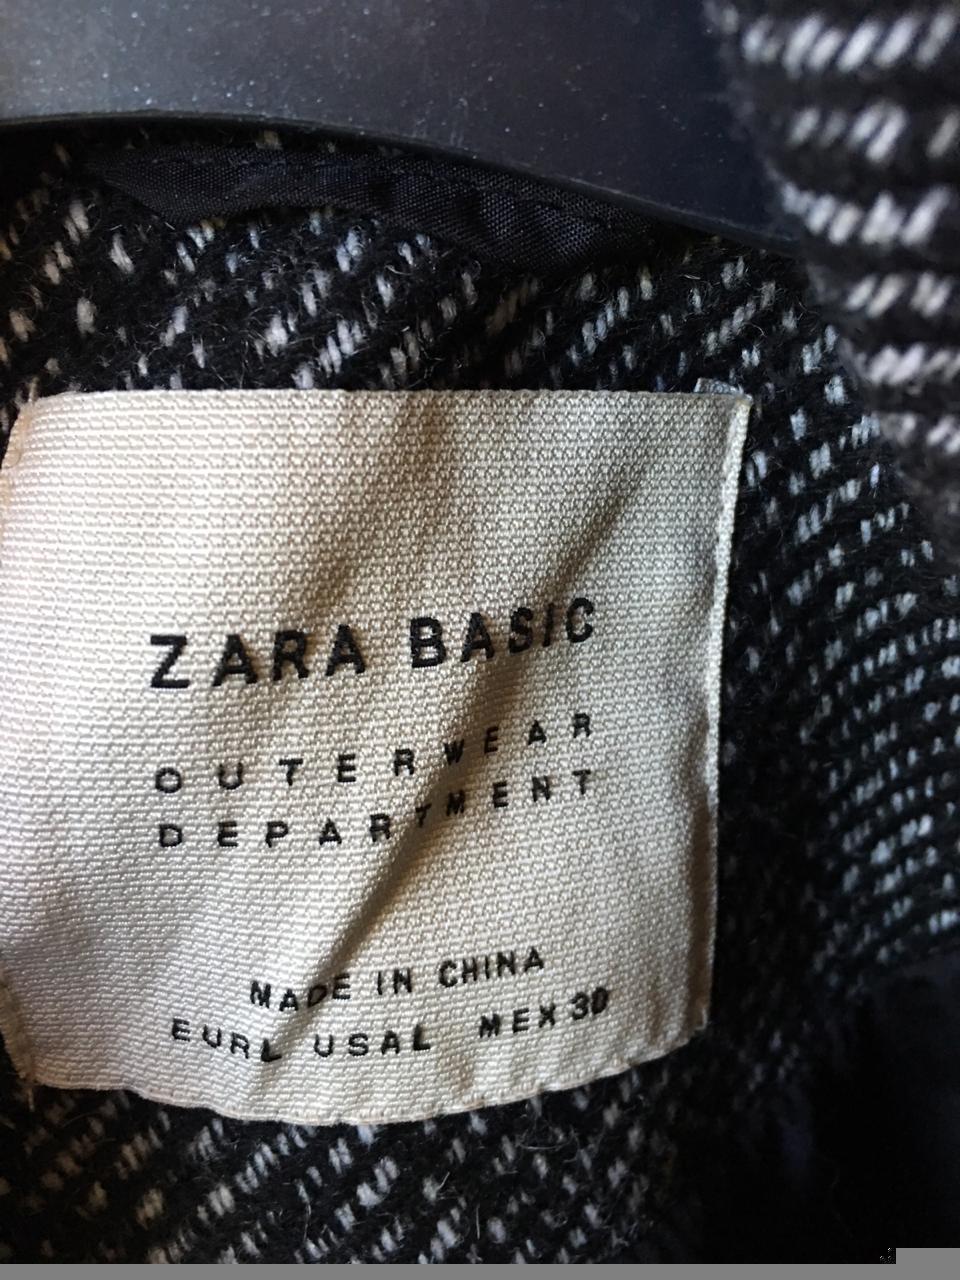 Conjunto Casaco e calças da Zara 3 Roupeiro.pt